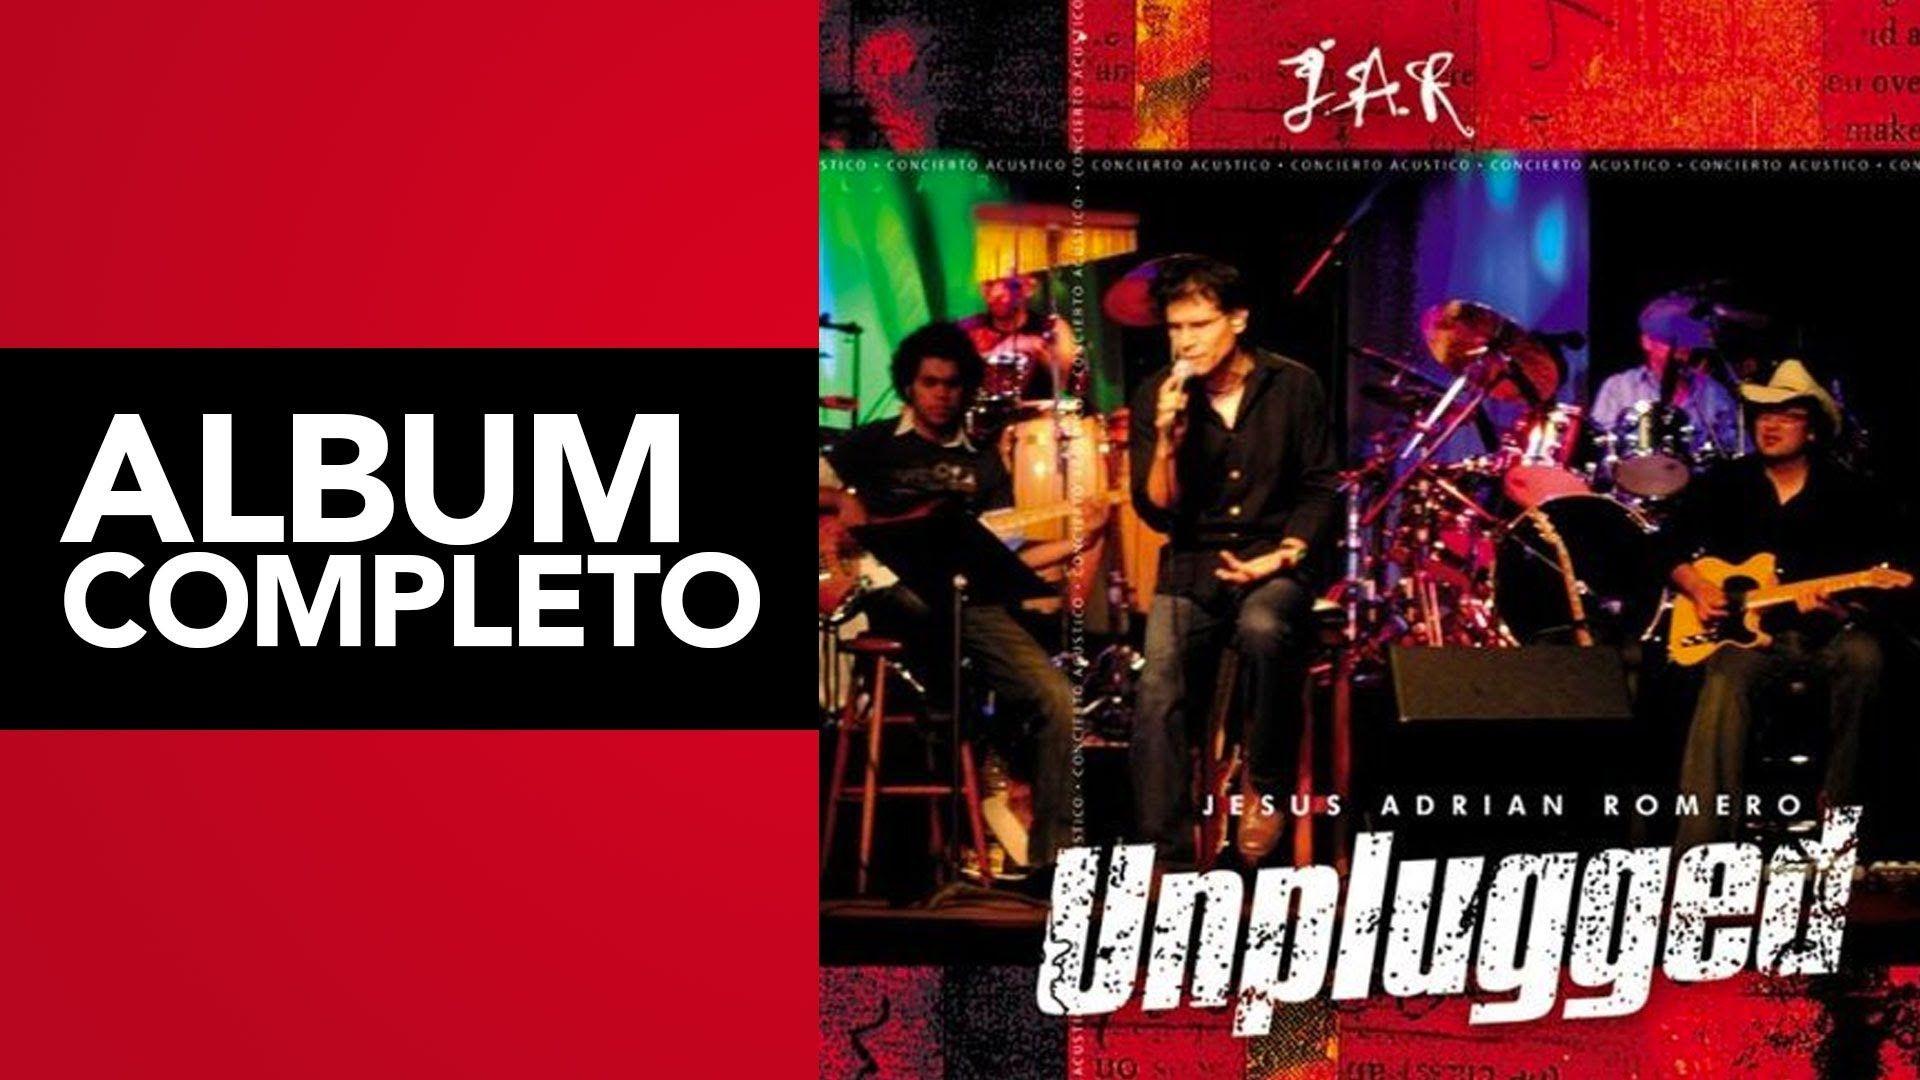 Unplugged Jesús Adrián Romero Album Completo Musicals Album Youtube